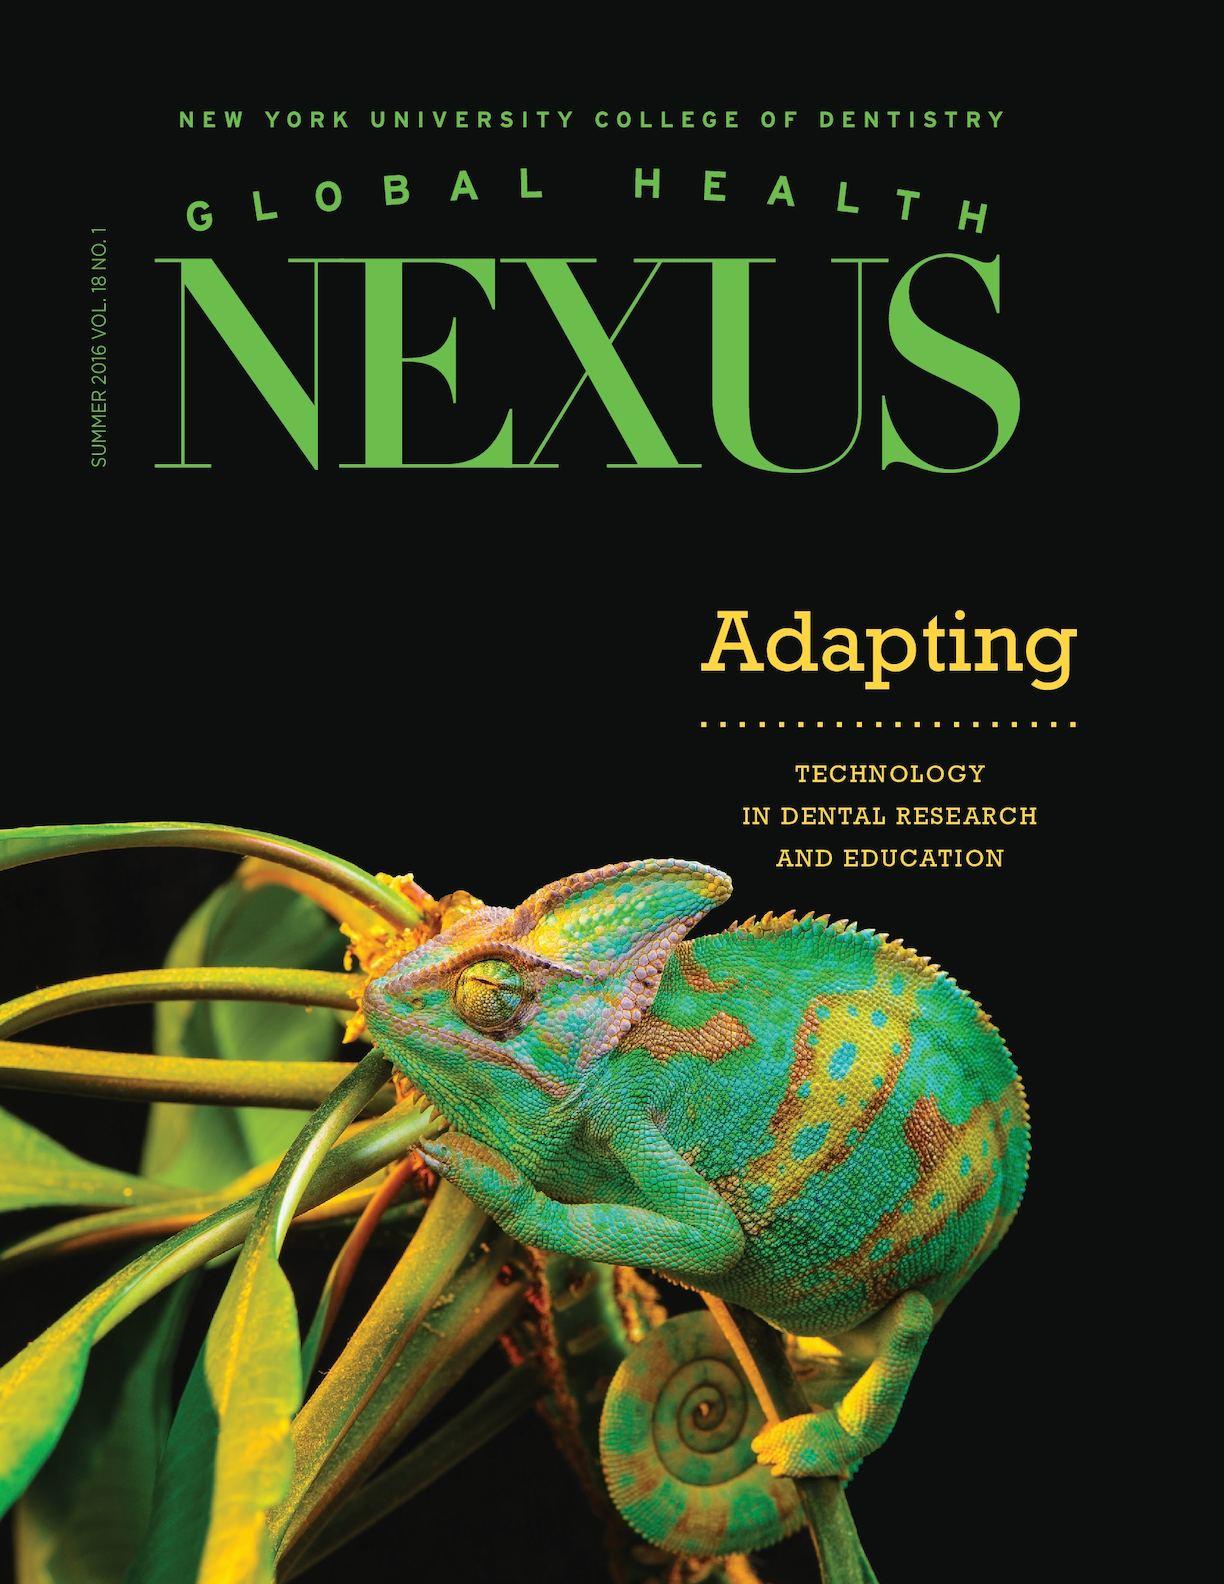 Calaméo - Global Health Nexus, Summer 2016: Adapting